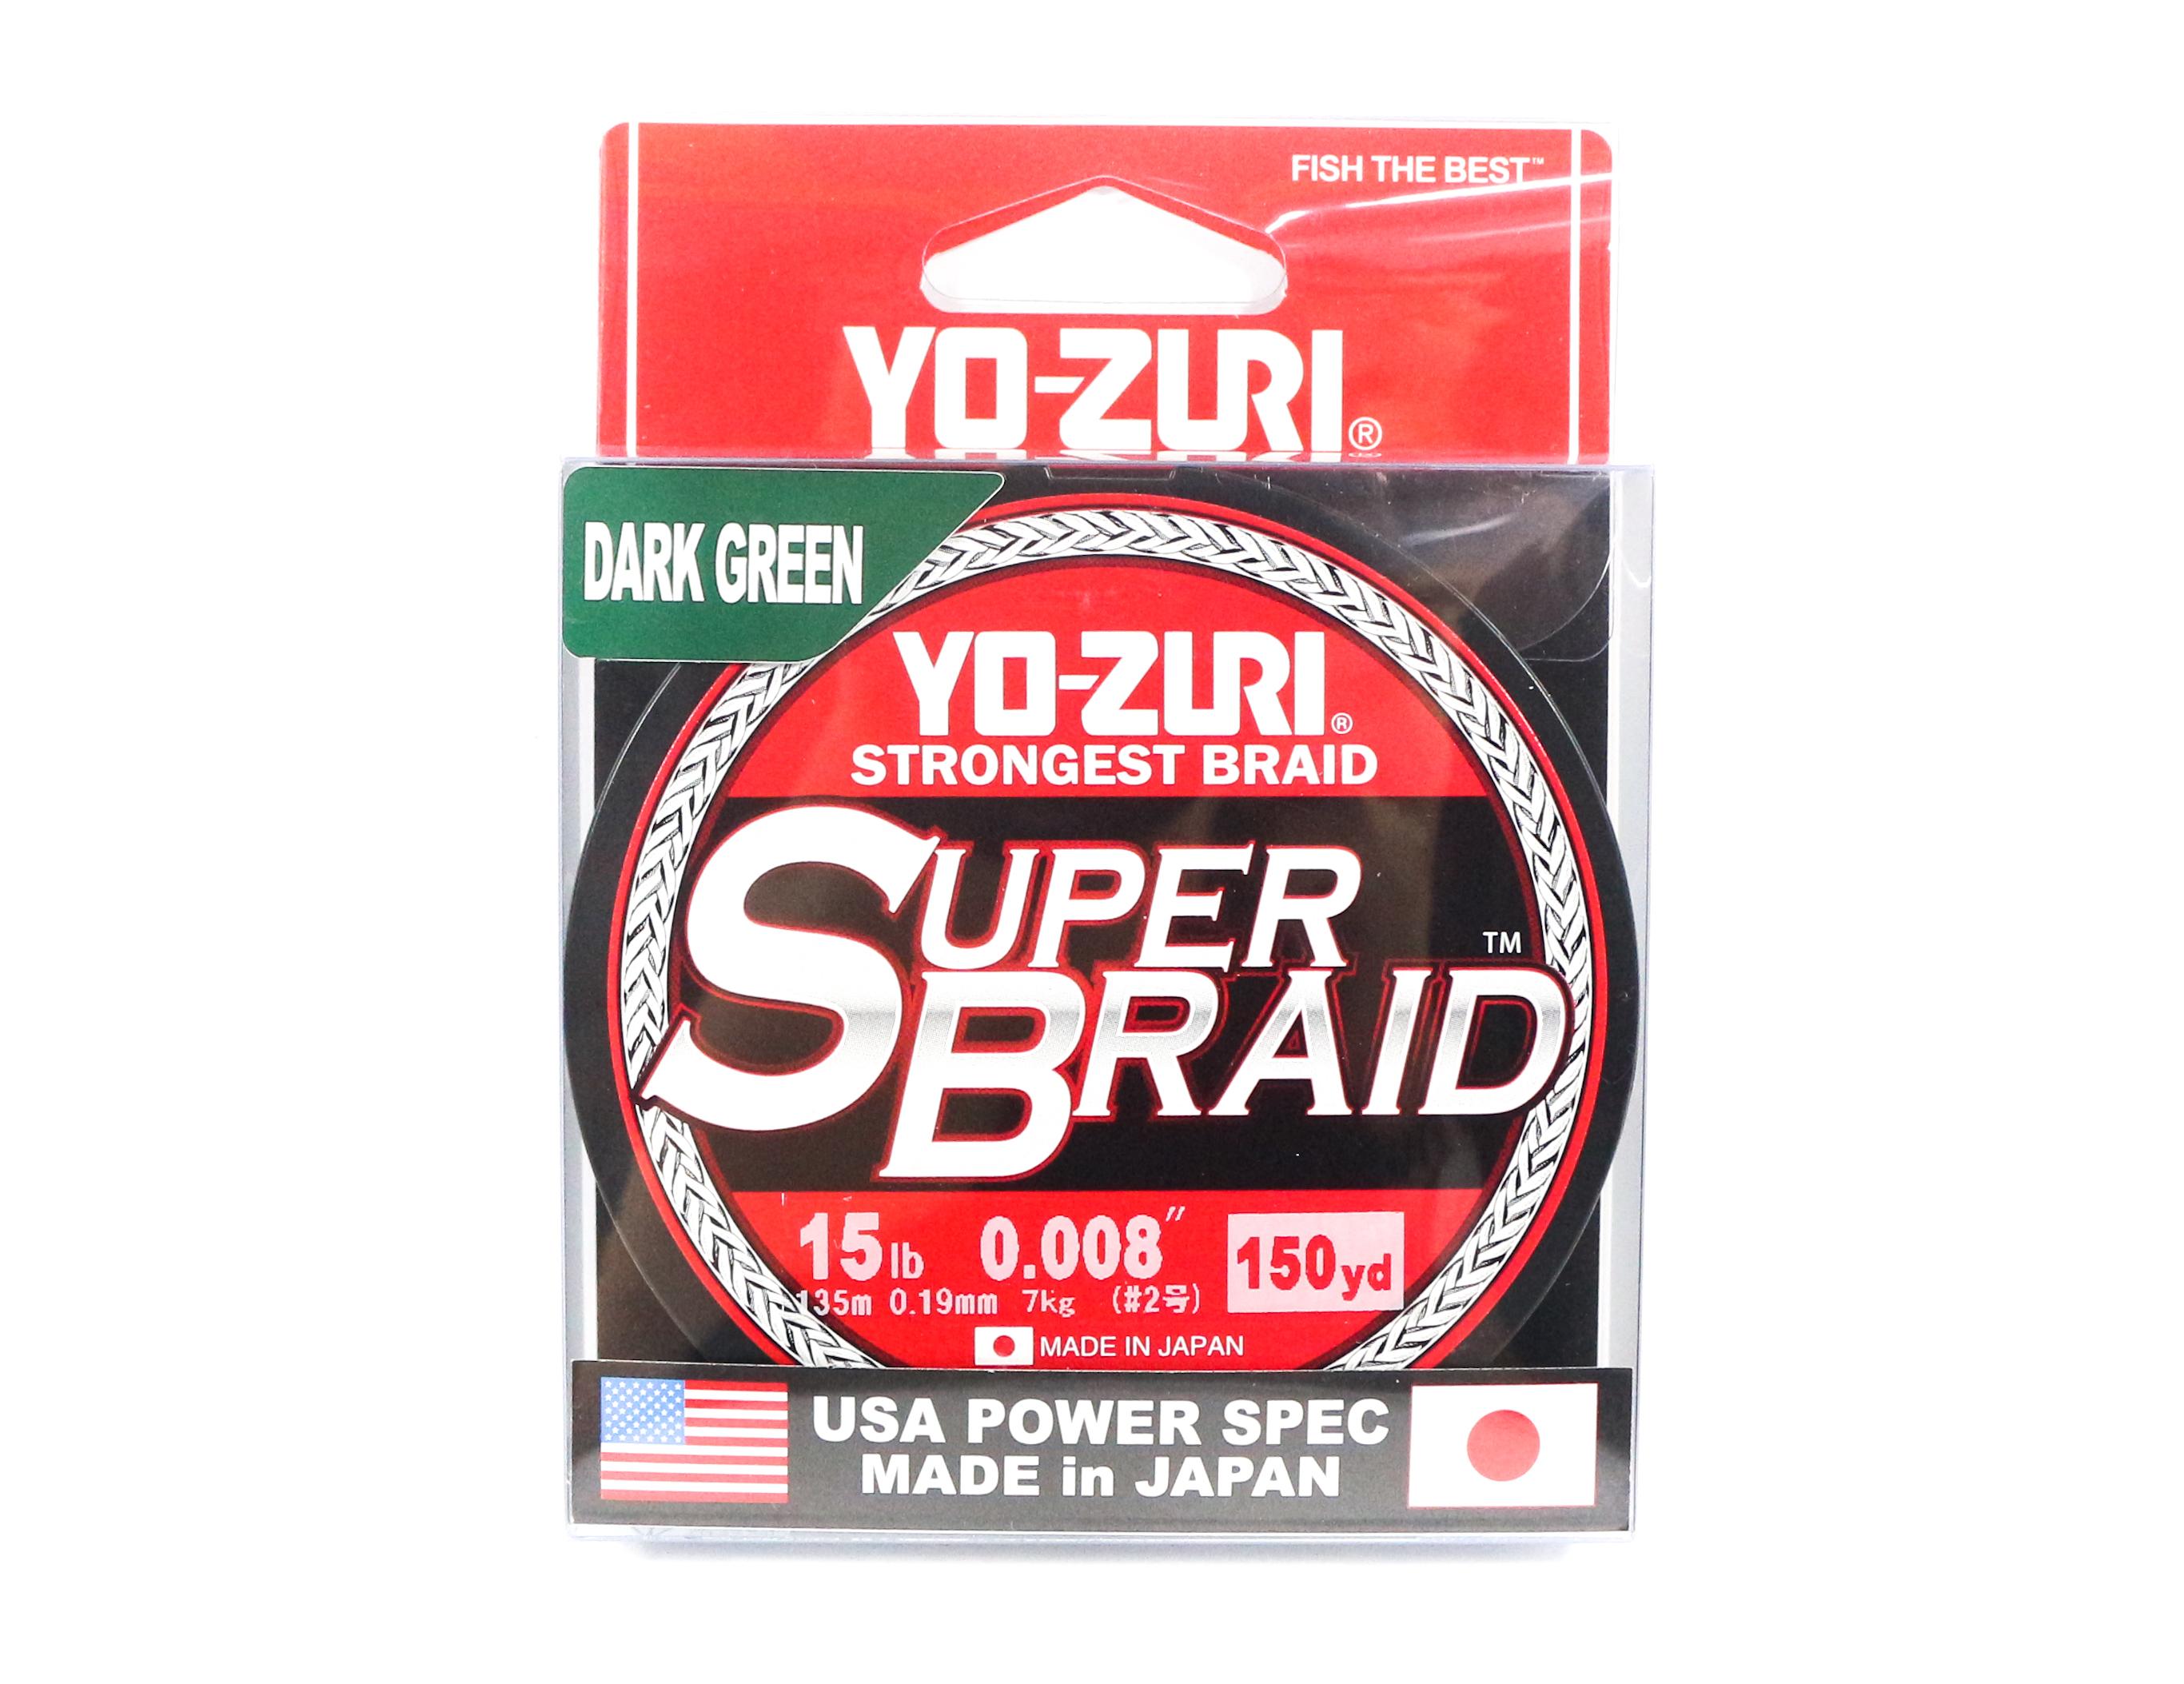 Yo Zuri Duel P.E Line Super Braid 150YDS 15Lbs (0.19mm) Green R1257-DG (1125)